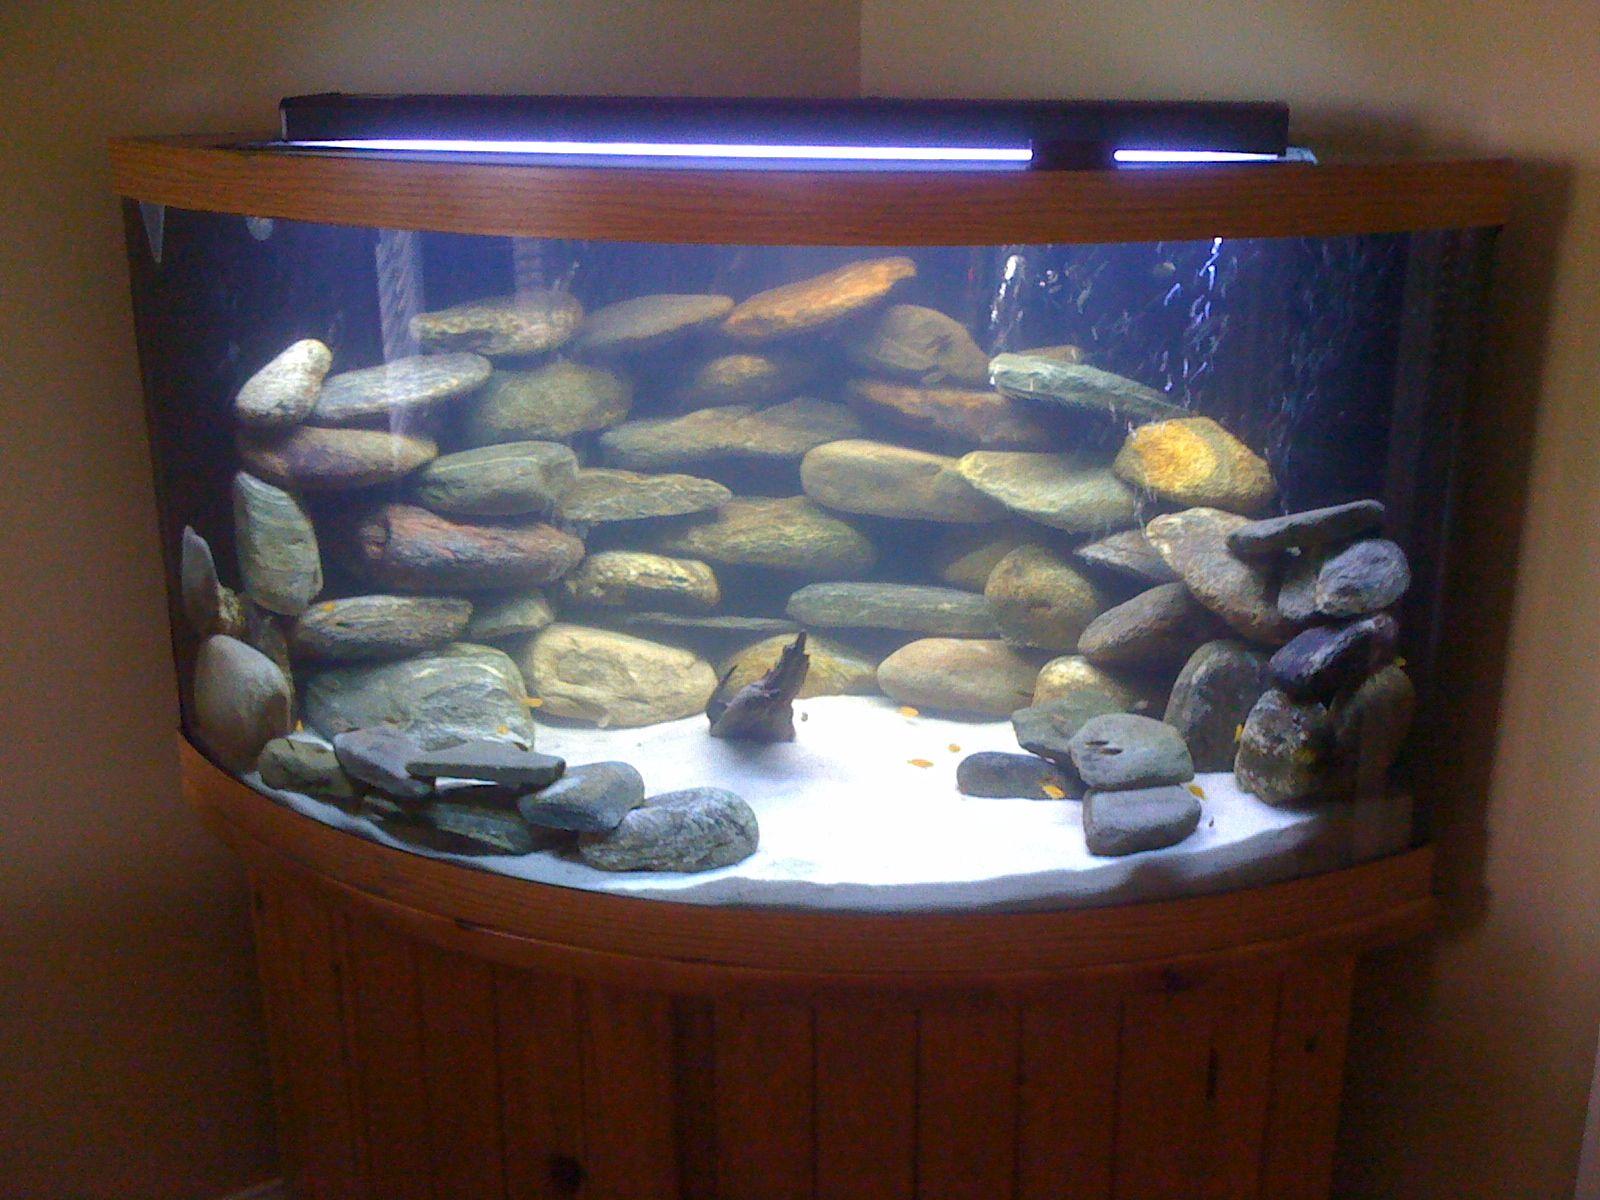 10 Gallon Fish Tank Stand Ideas For Your Aquarium